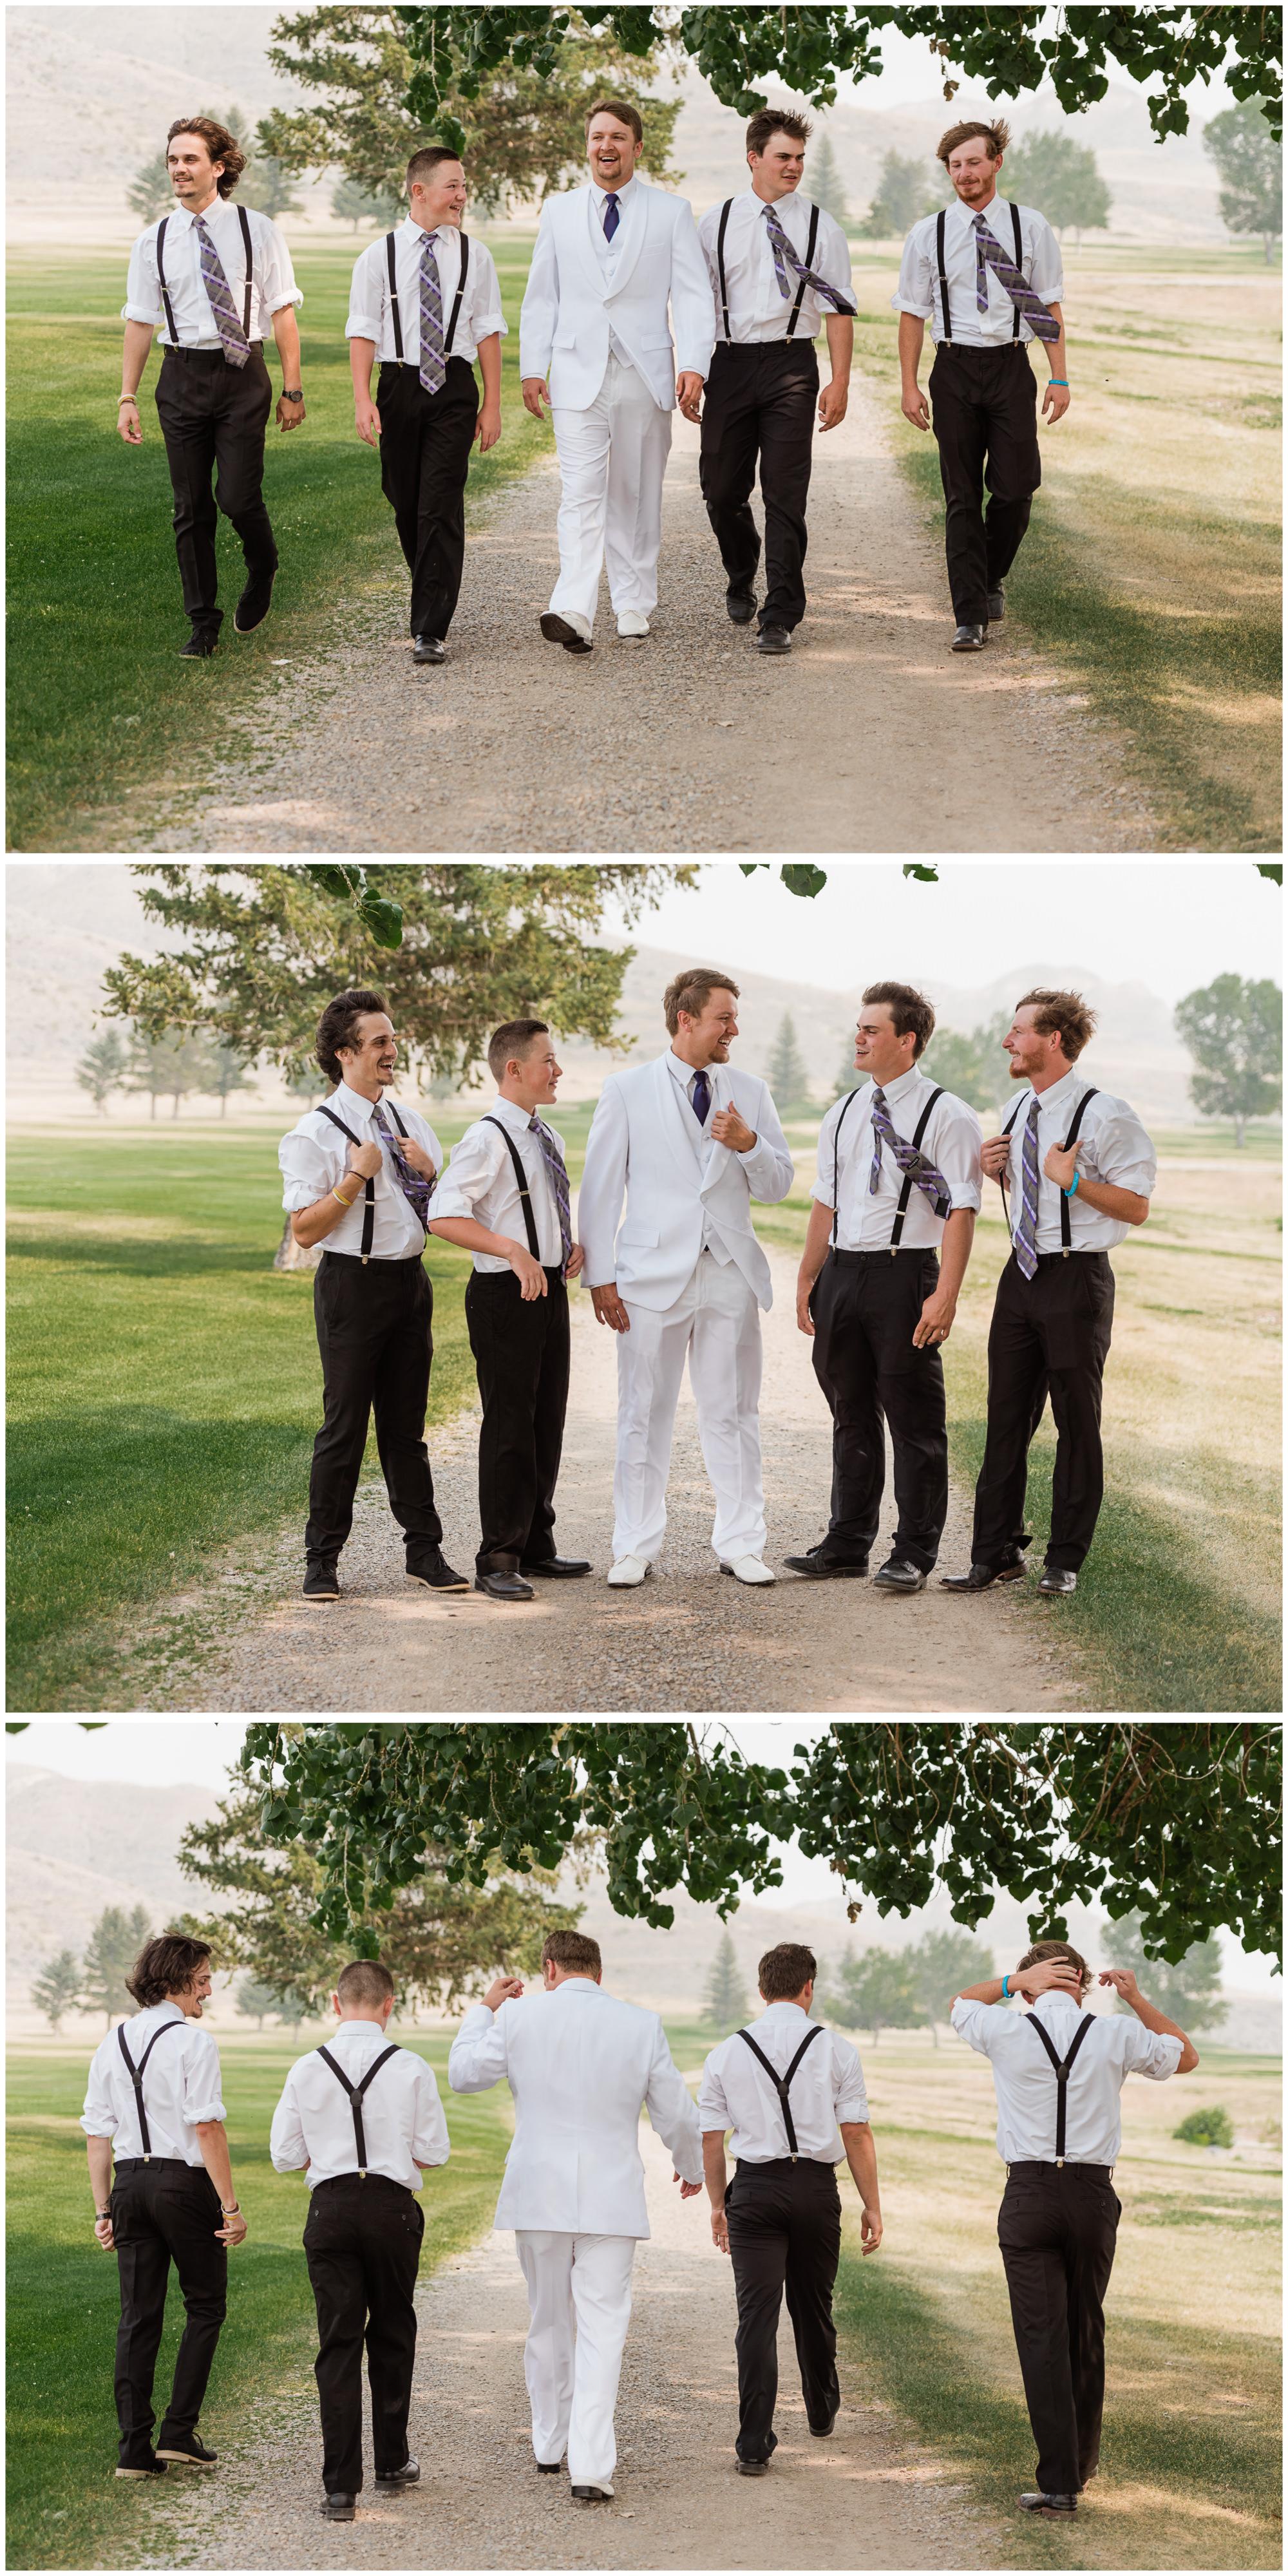 The boys, Smoky Montana wedding